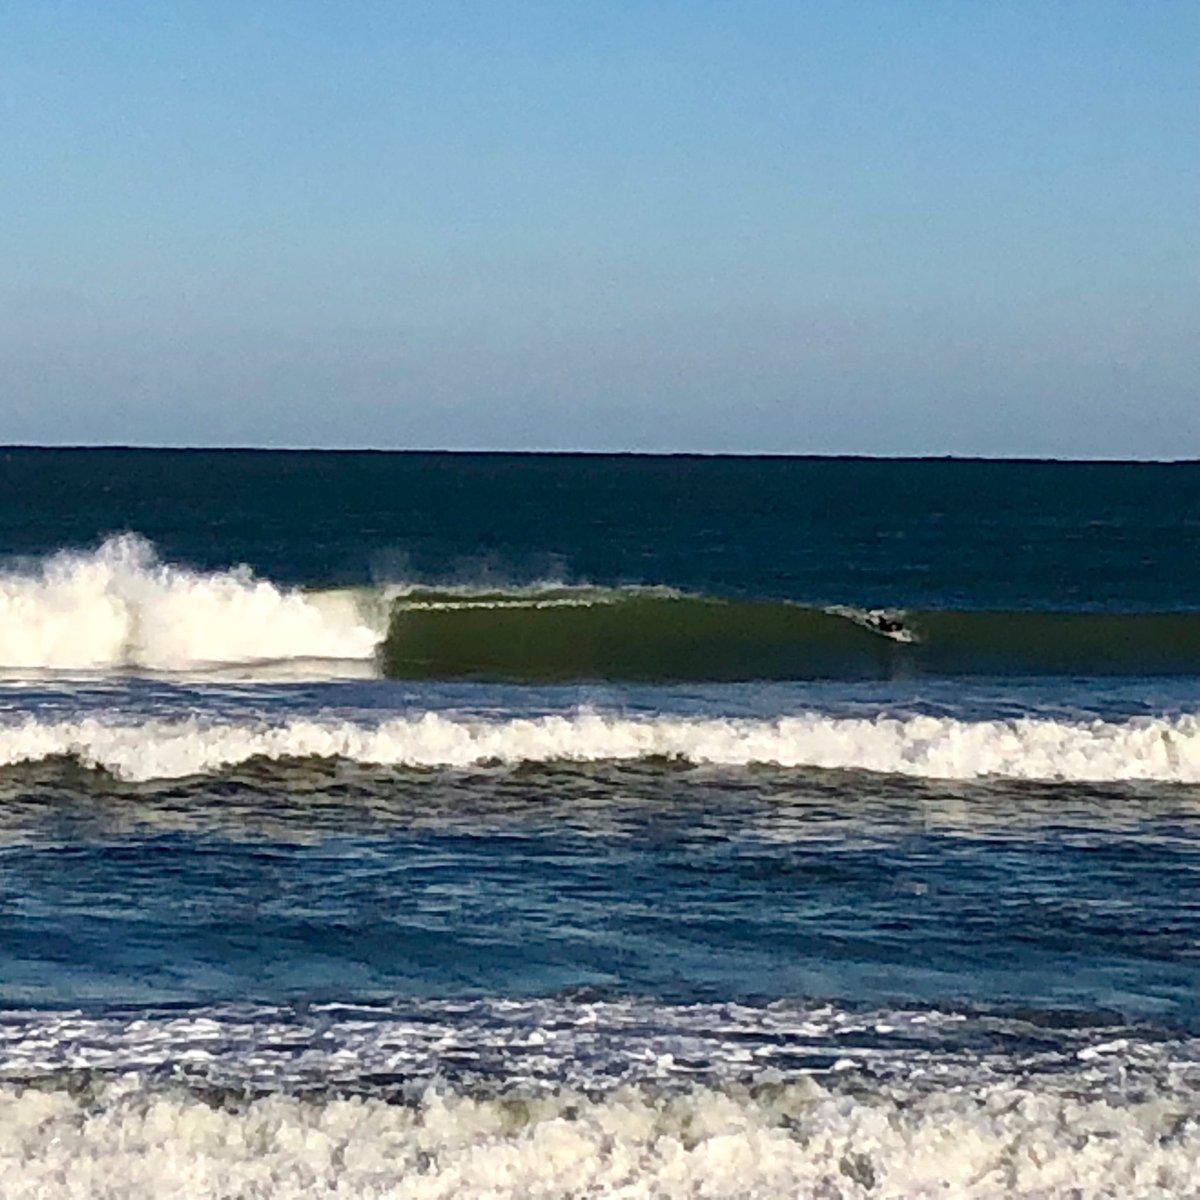 James Wieland SurfnWeatherman Twitter - The 7 best beaches for winter surfing